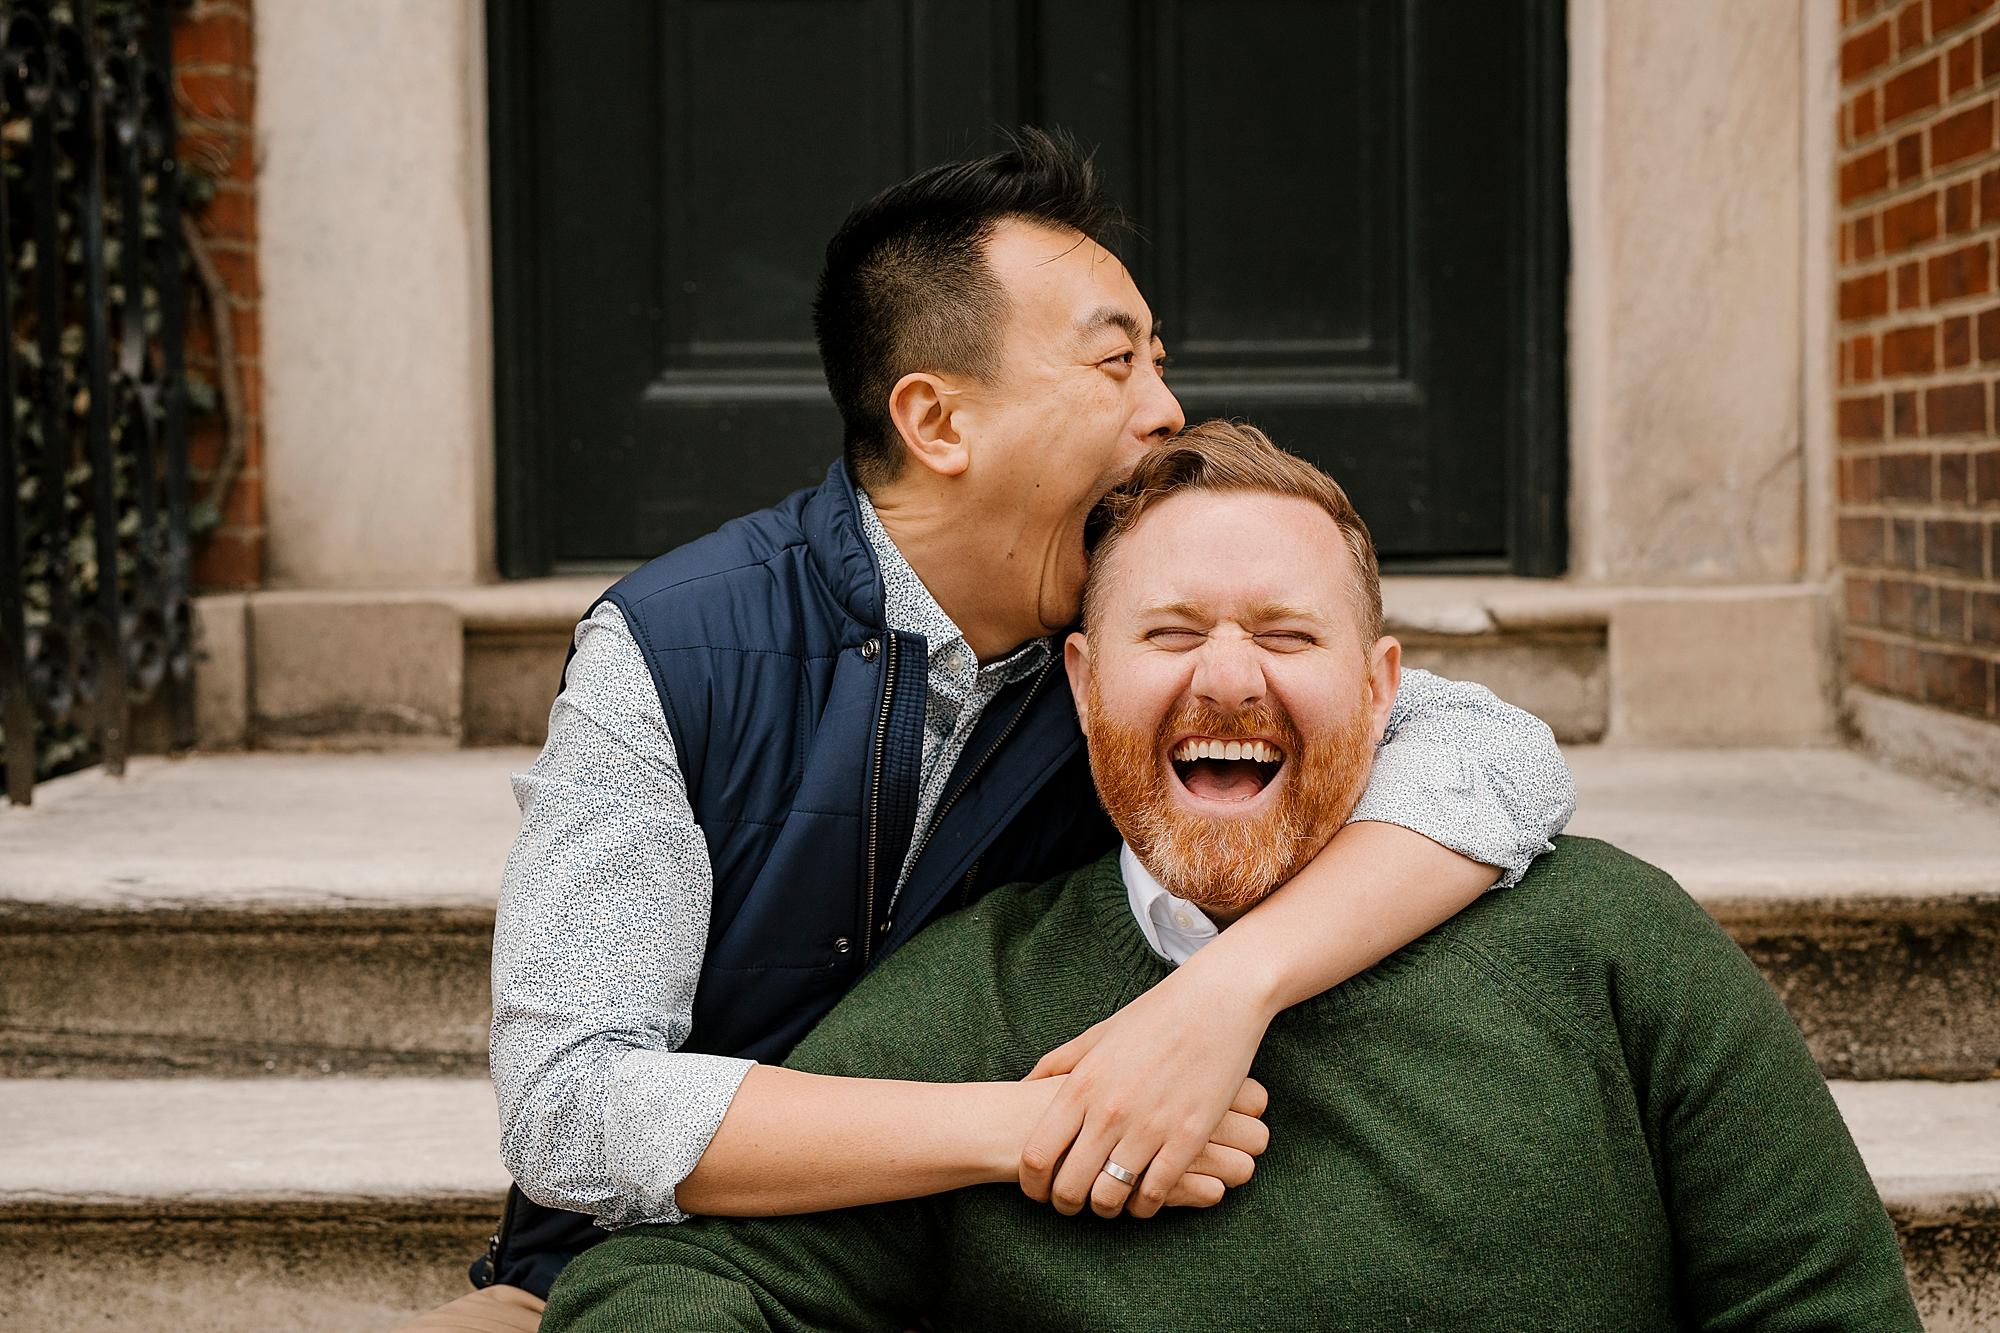 Love_BY_Joe_Mac_Creative_Philadelphia_Philly_Wedding_Photography_Gay_LGBT_Queer_Washington_Square_Park_Philadelphia__0019.jpg